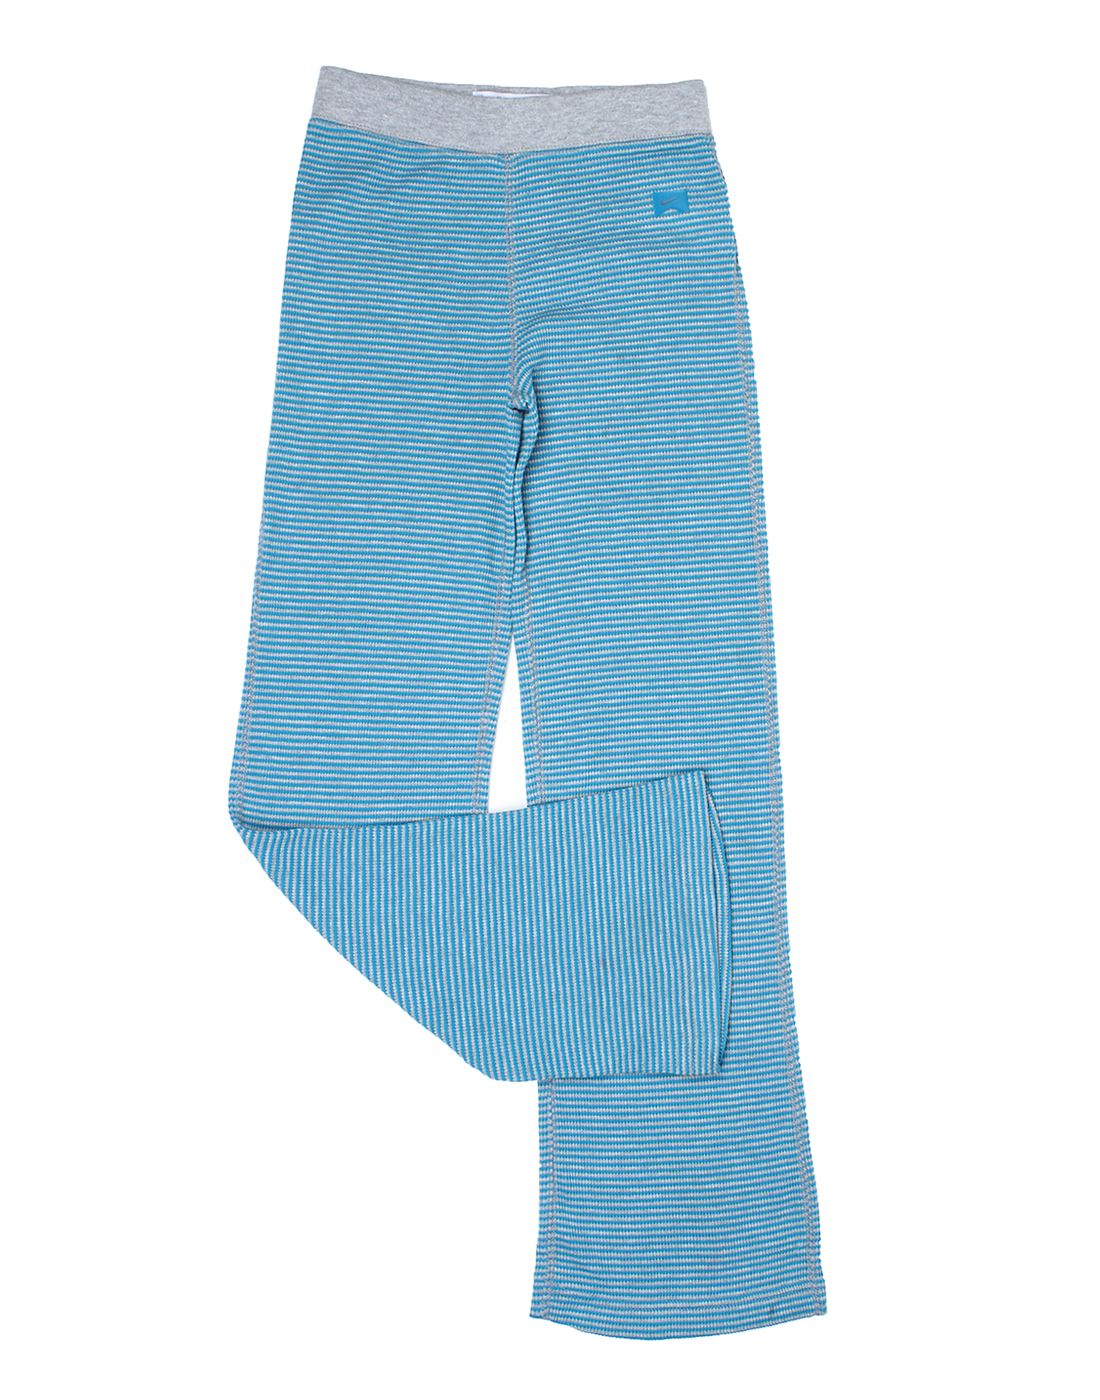 Nike Blue Cotton Girls Bottom